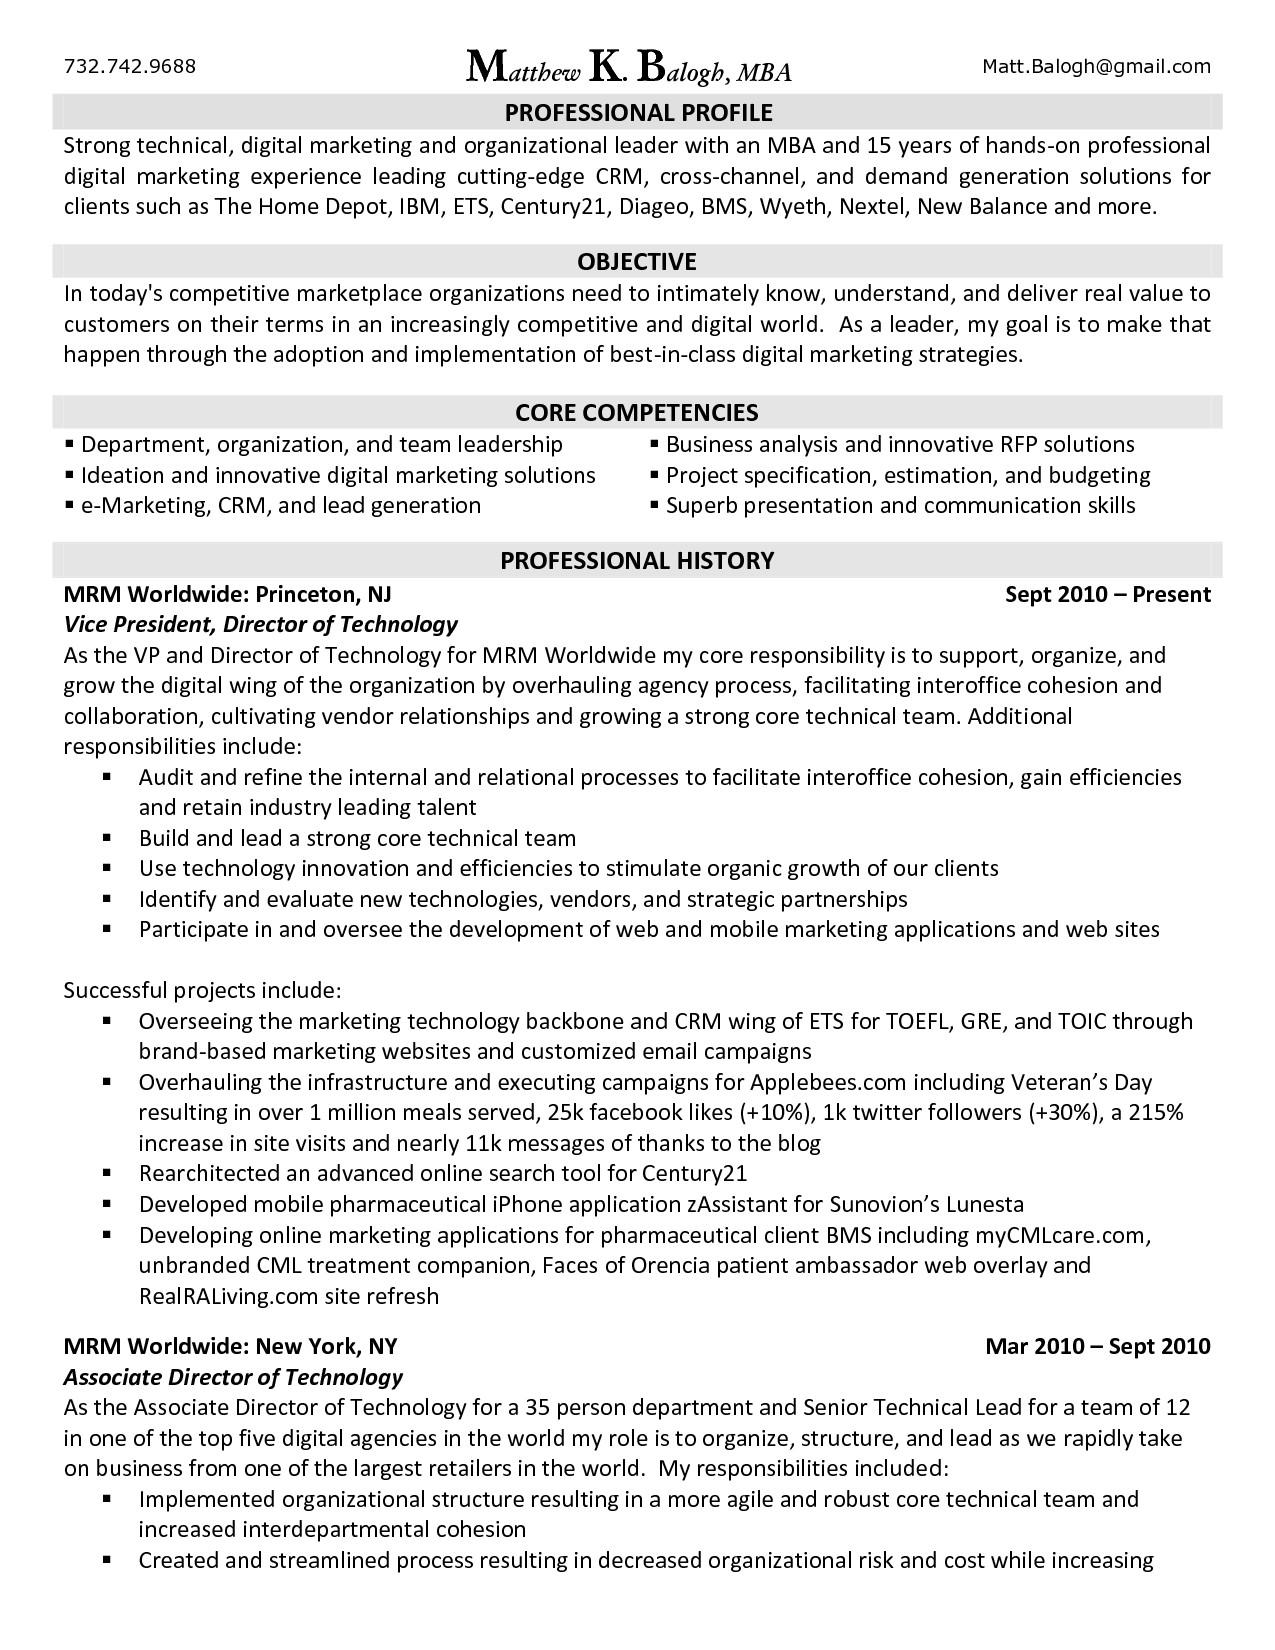 Digital Marketing Resume Sample Digital Marketing Resume Fotolip Rich Image and